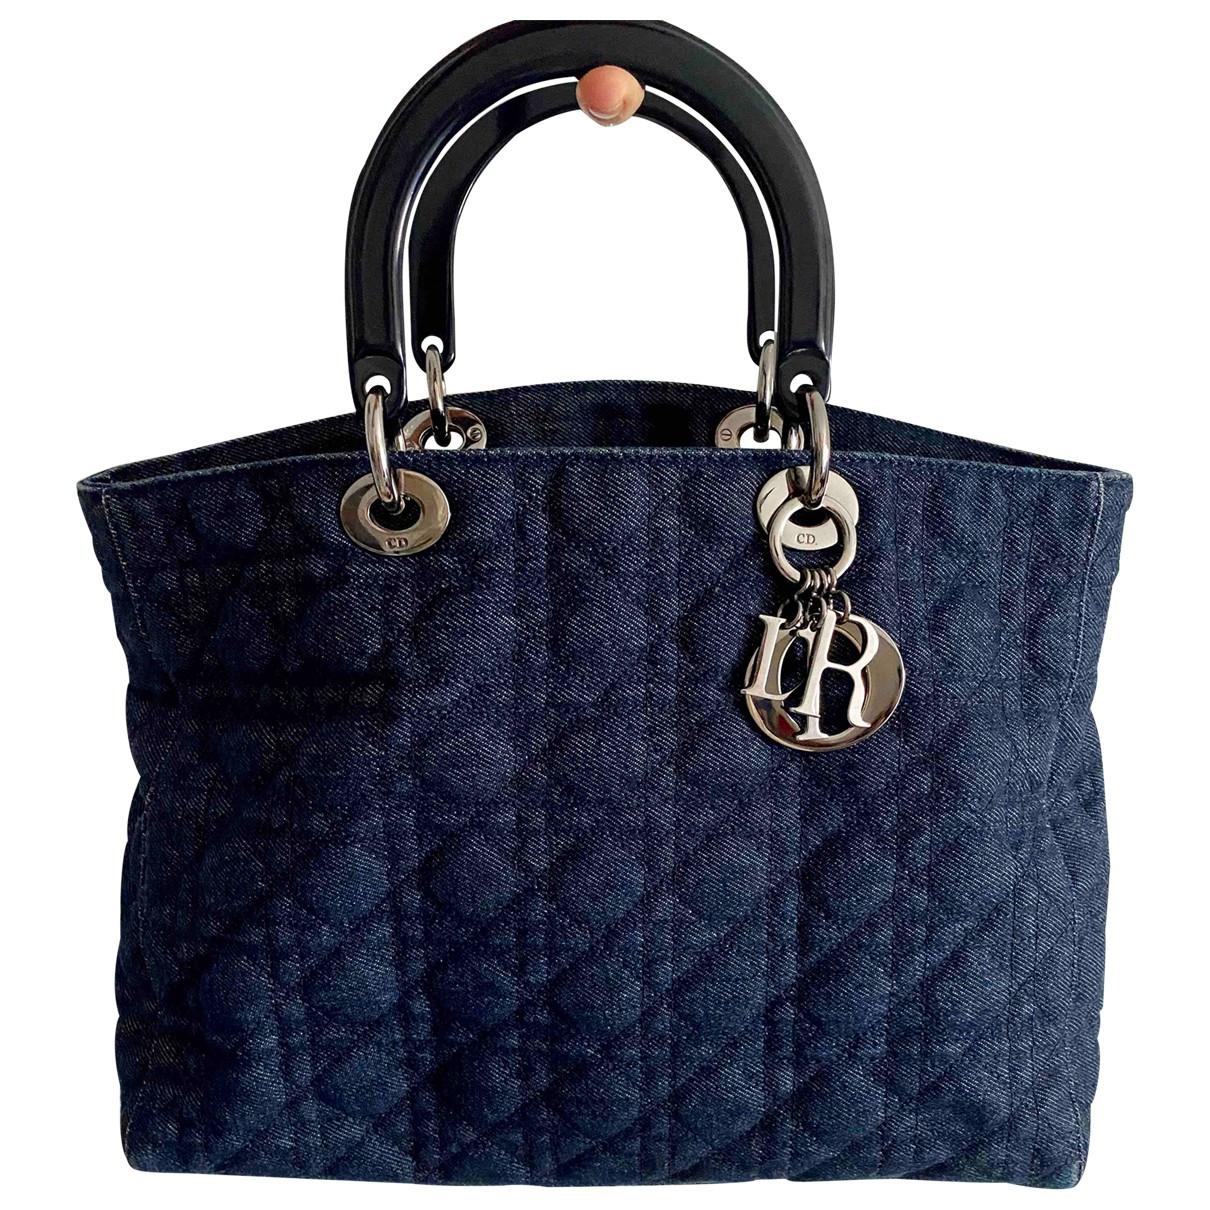 Christian Dior \N Handtasche in  Blau Denim - Jeans